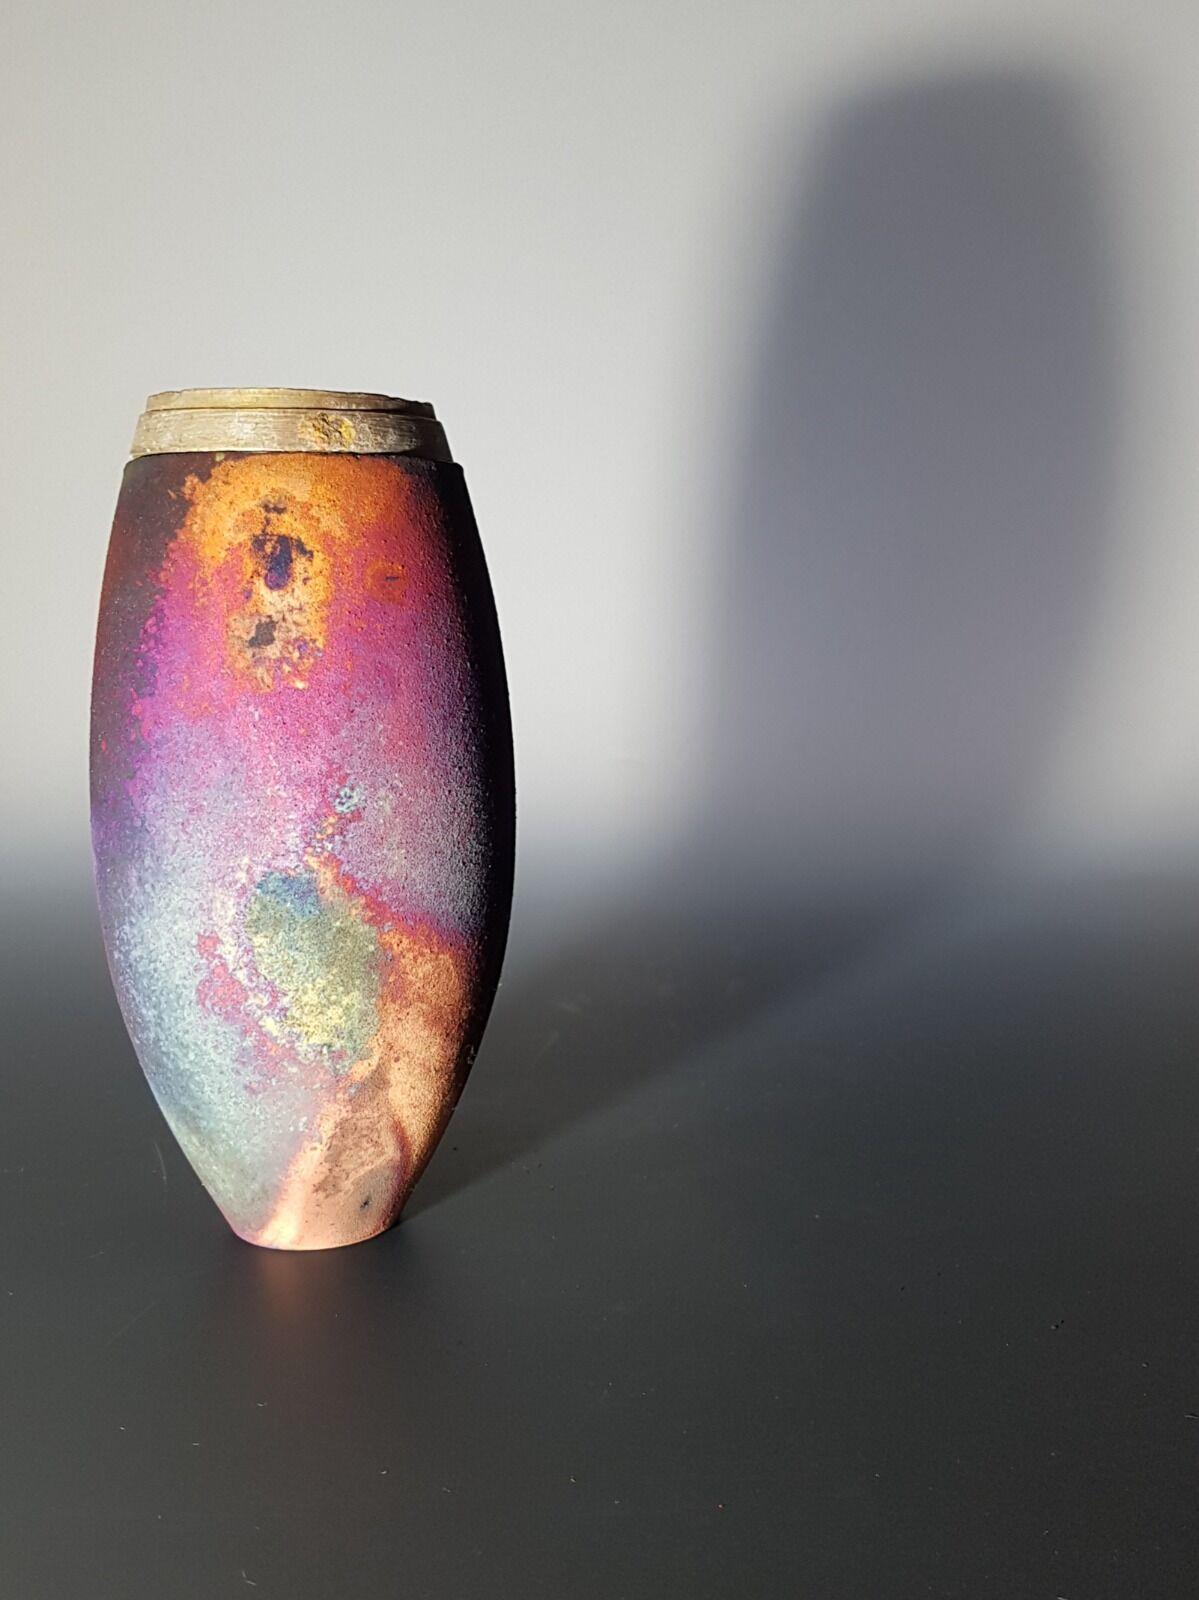 Conical form with ww1 shrapnel rim